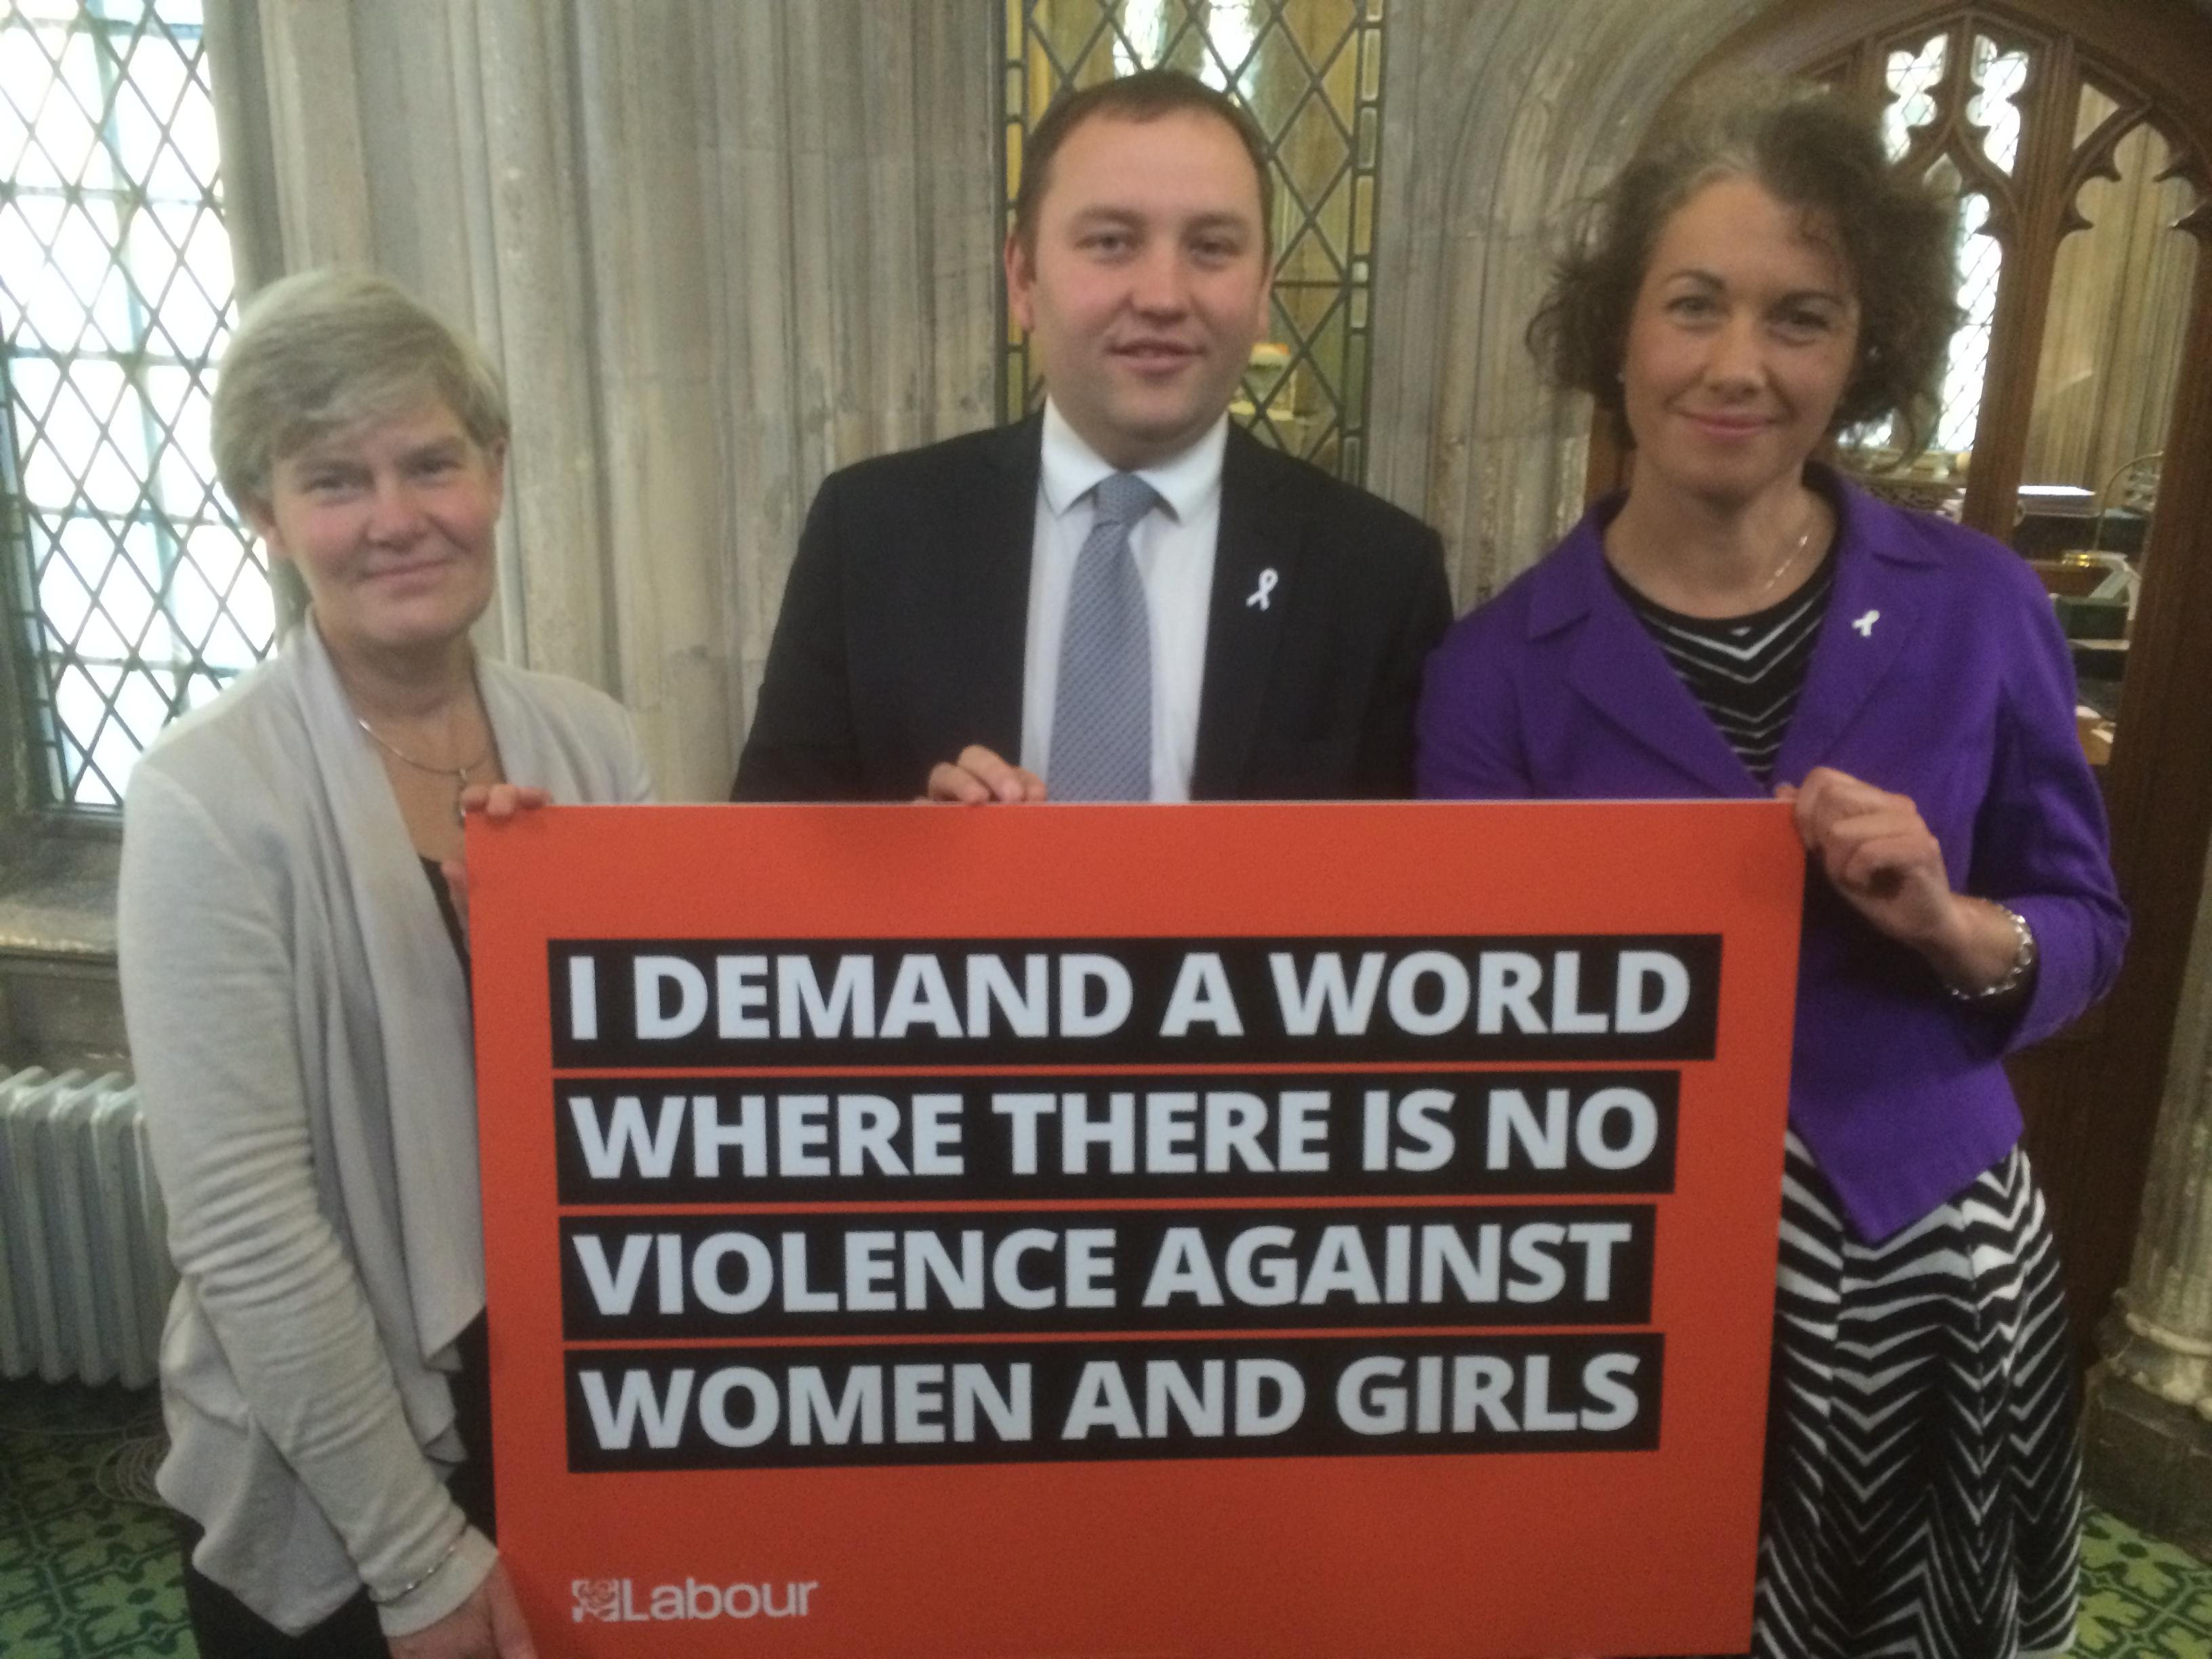 violence_against_women.jpeg